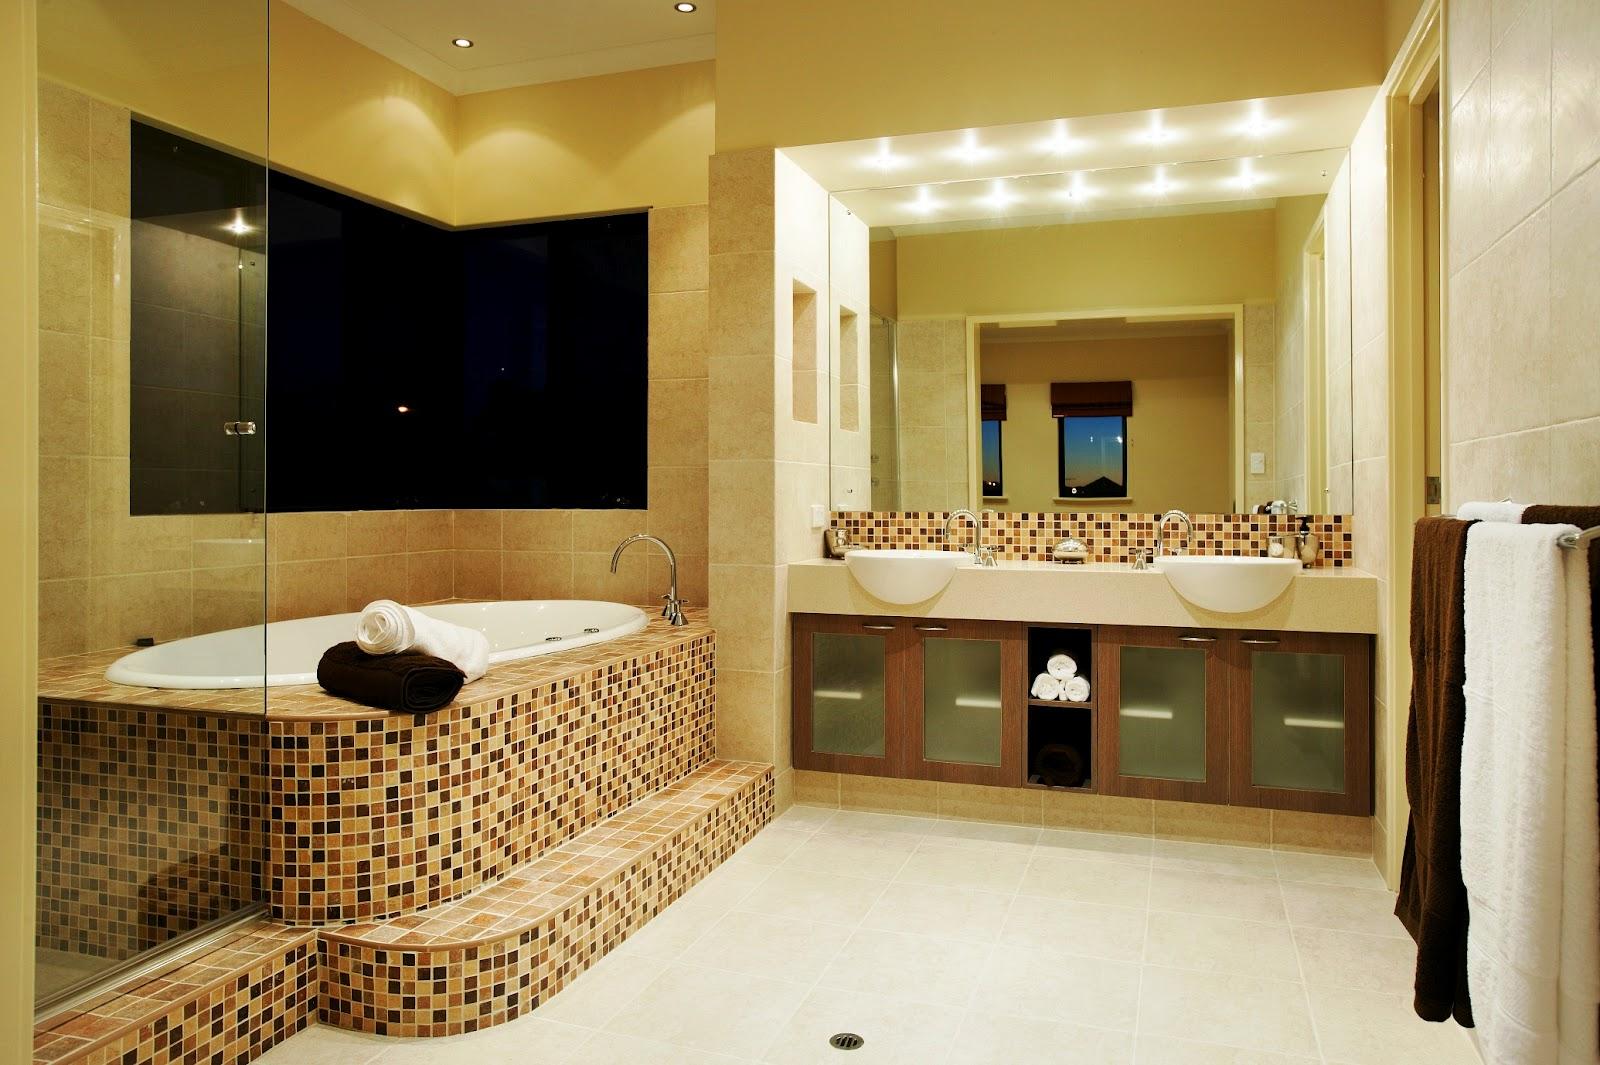 Fashion Hairstyle Celebrities: Home Bathroom Designs|Bathroom Wall ...